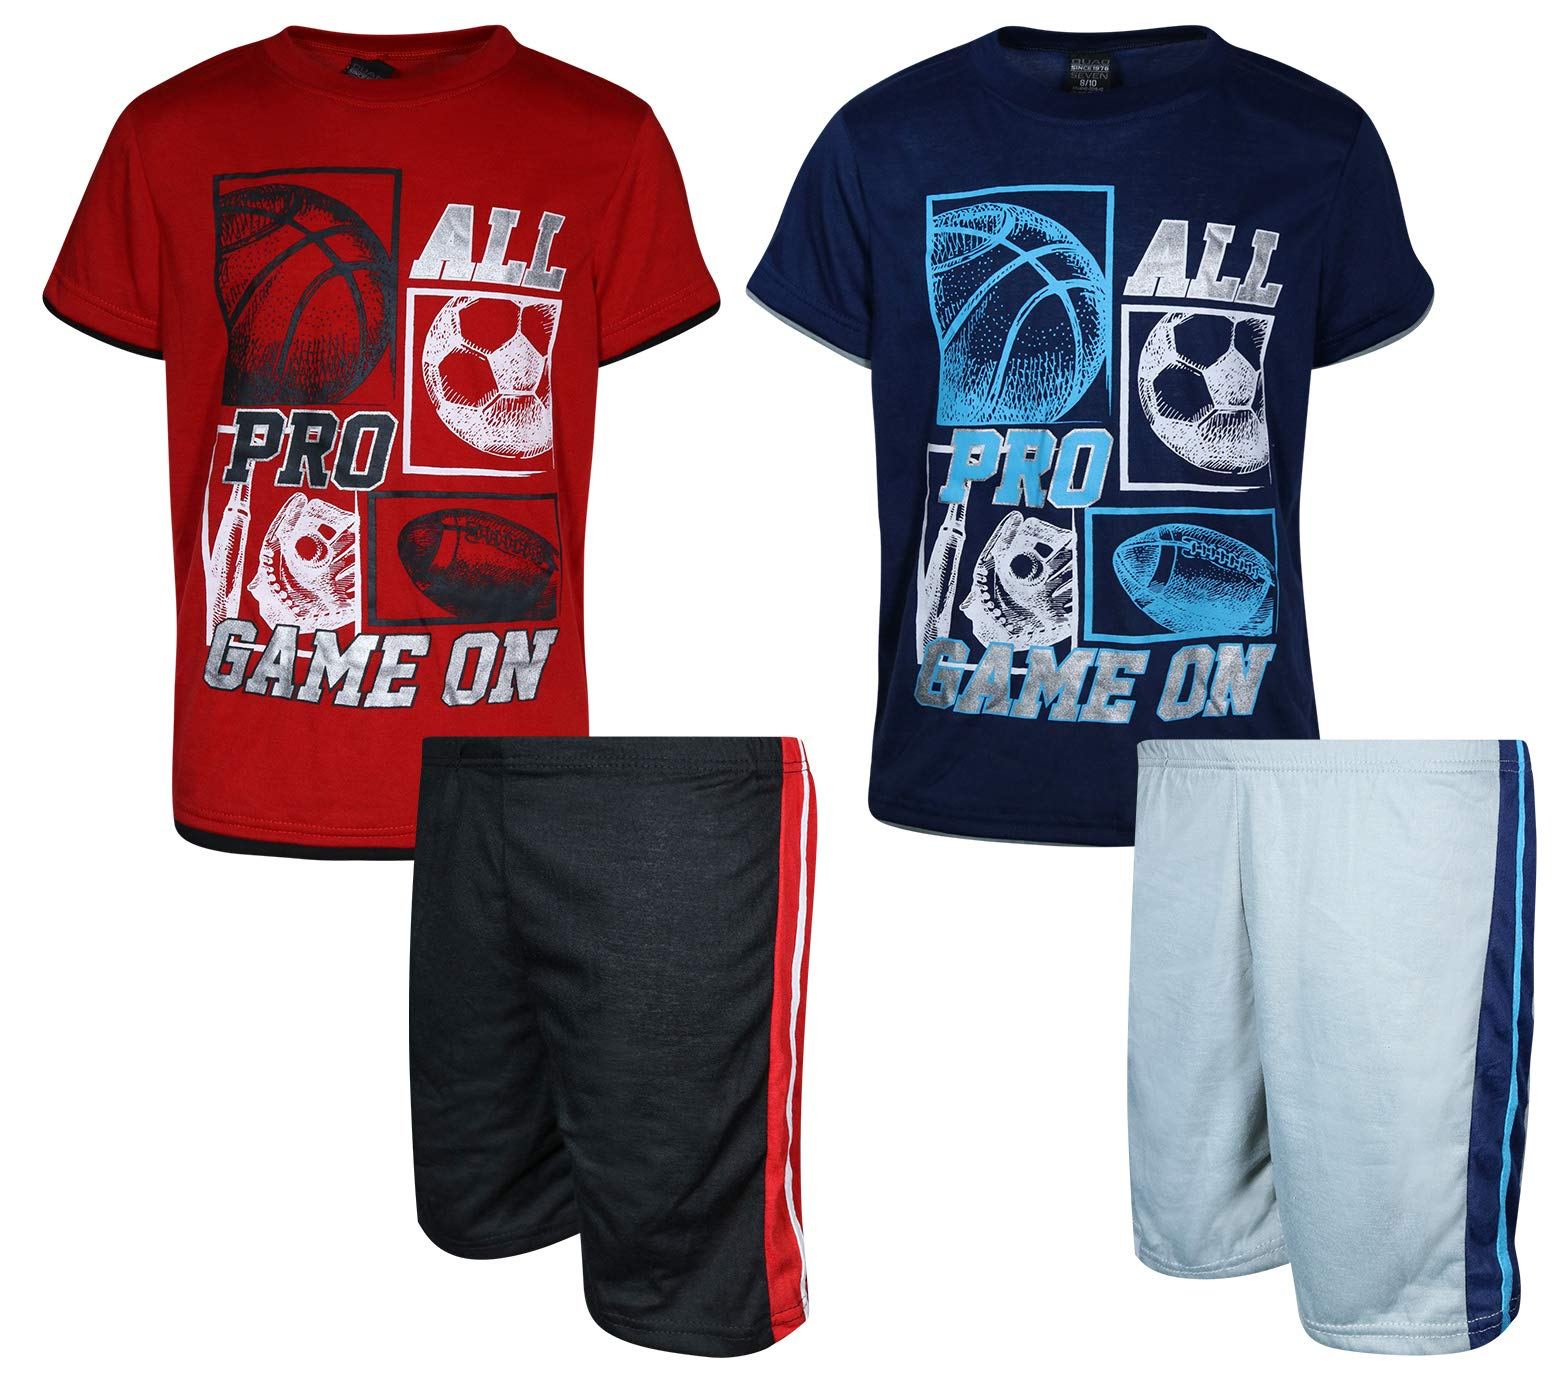 Quad Seven Boys' 4-Piece Summer Pajama Short Set, All Pro, Size 12/14'